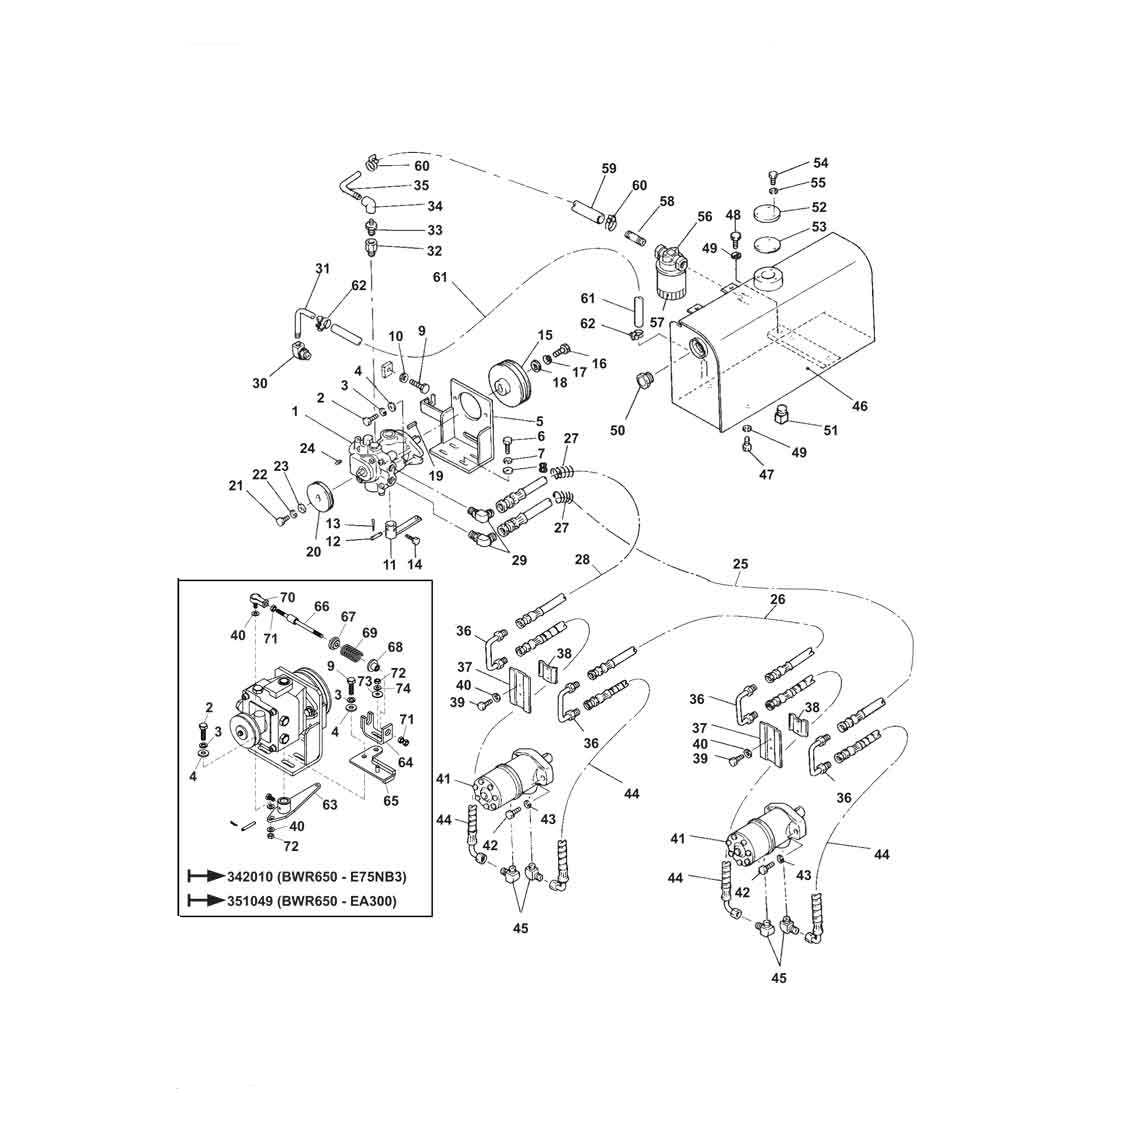 hight resolution of part diagram